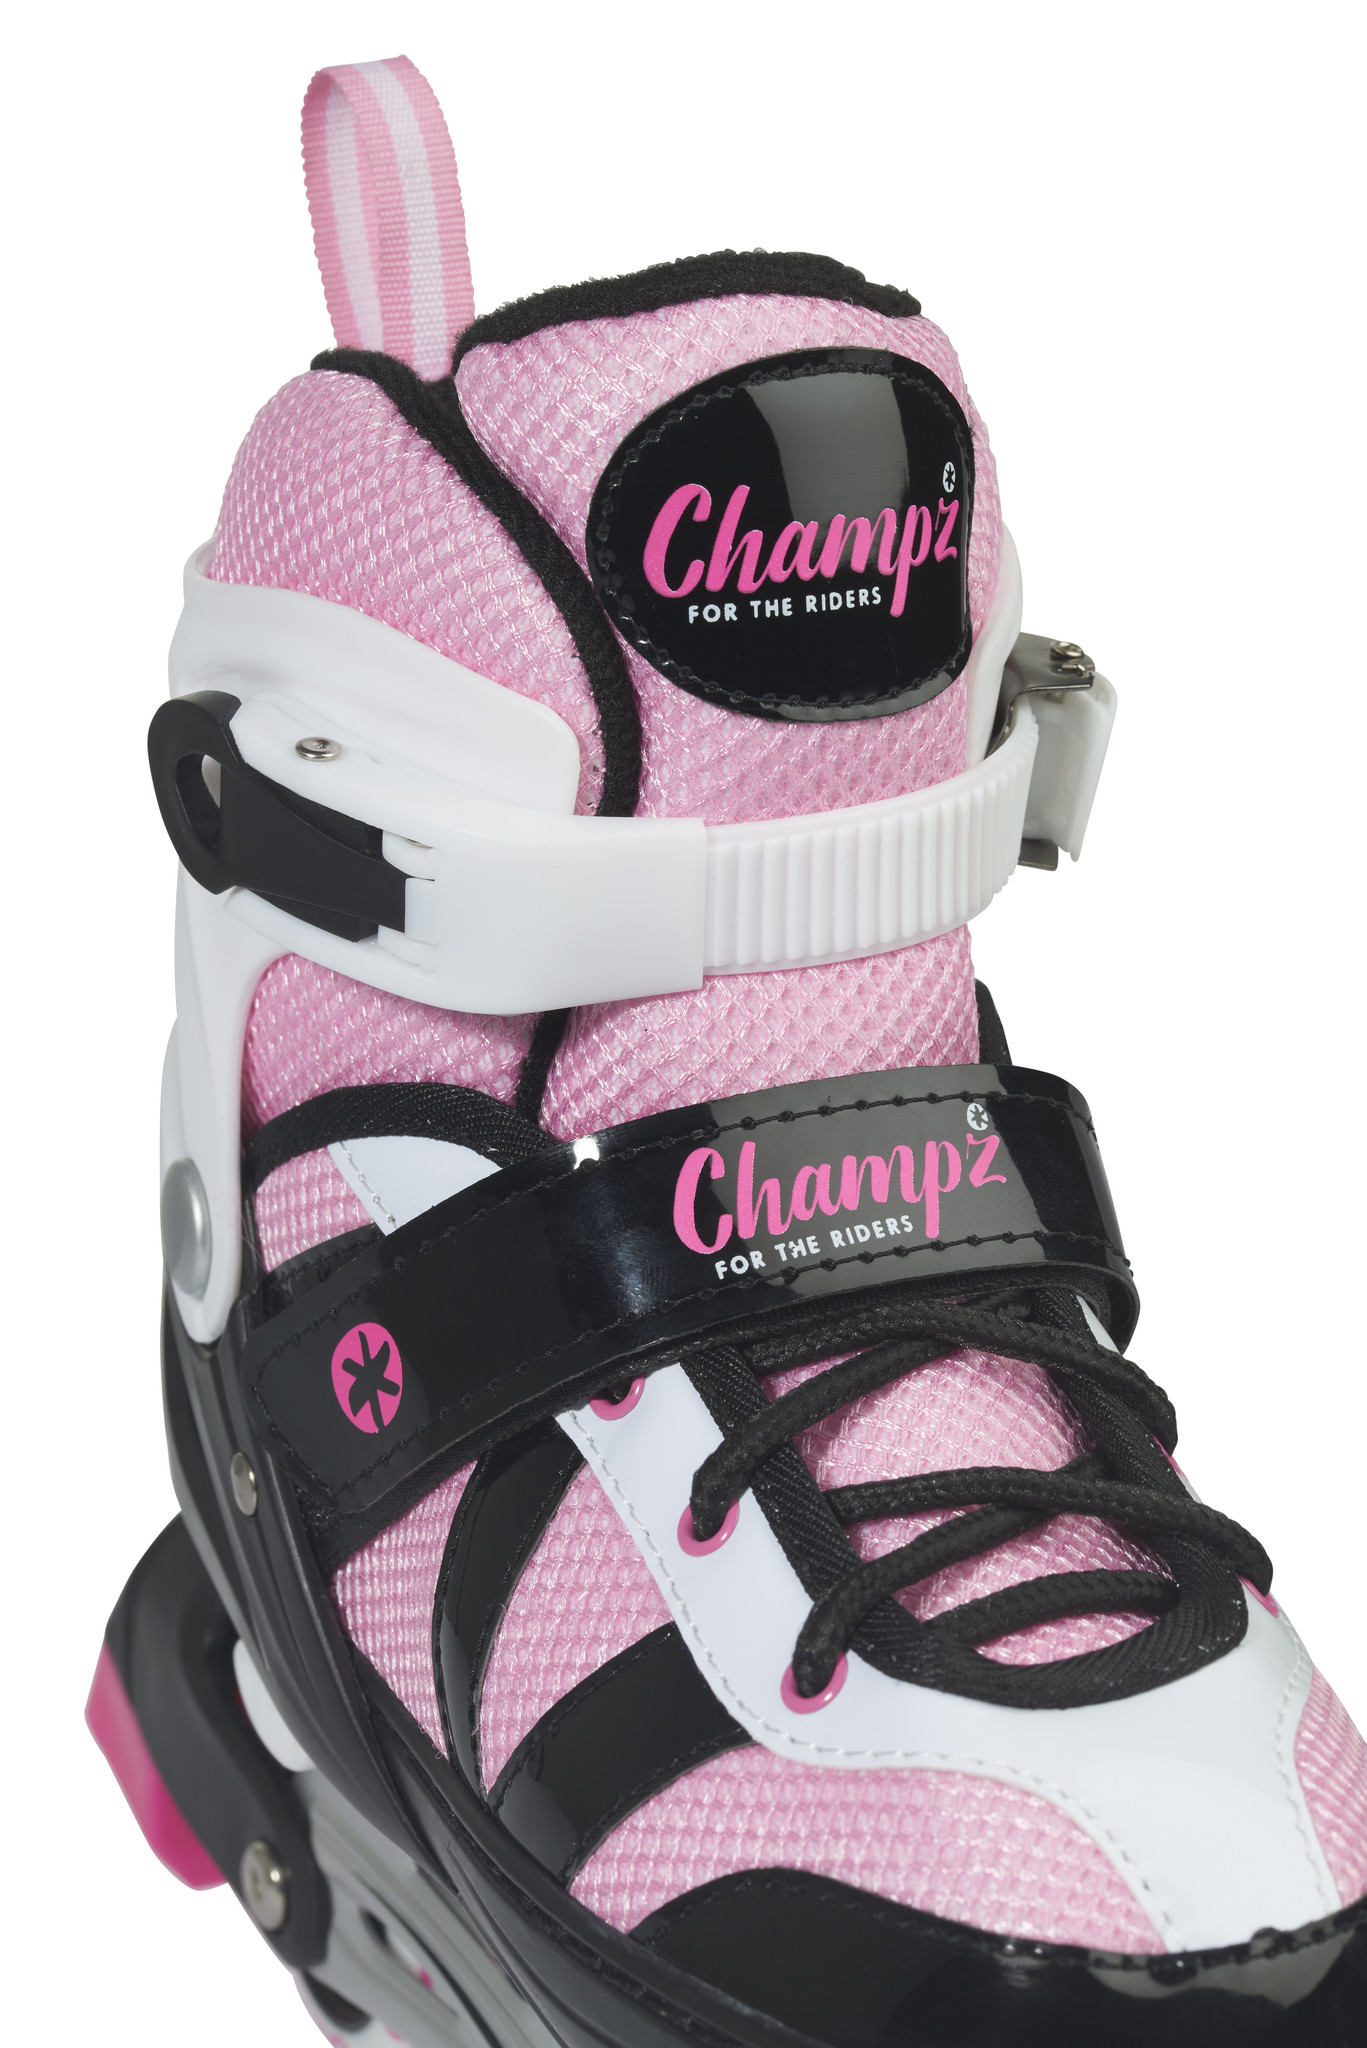 CHAMPZ CHAMPZ INLINE SKATES,  ROZE/WIT